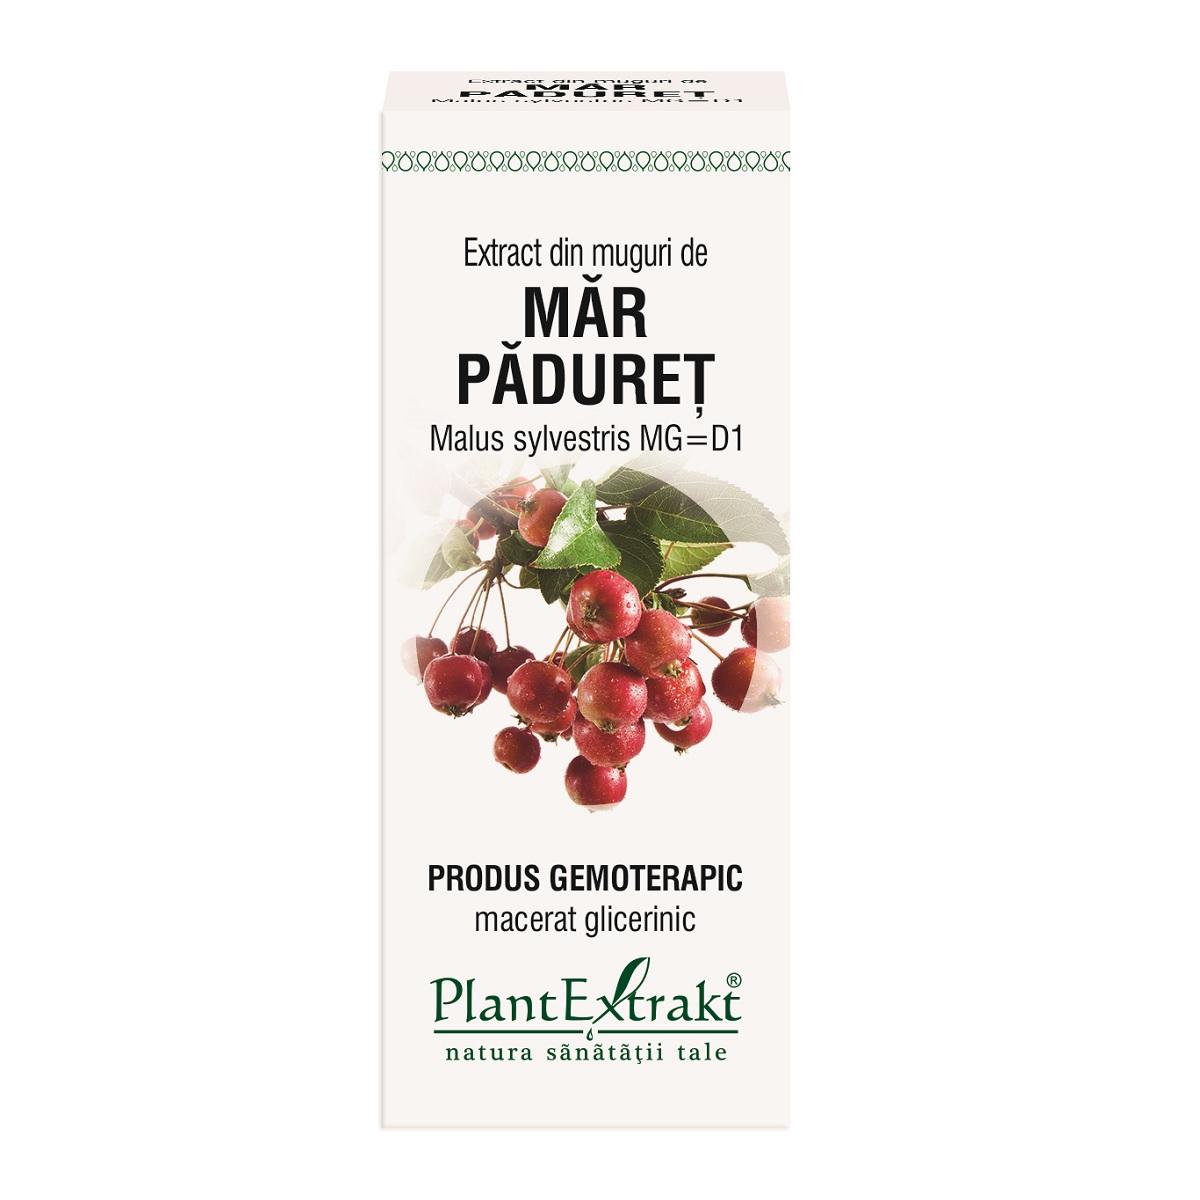 Extract din muguri de Mar Paduret, 50ml, Plantextrakt imagine produs 2021